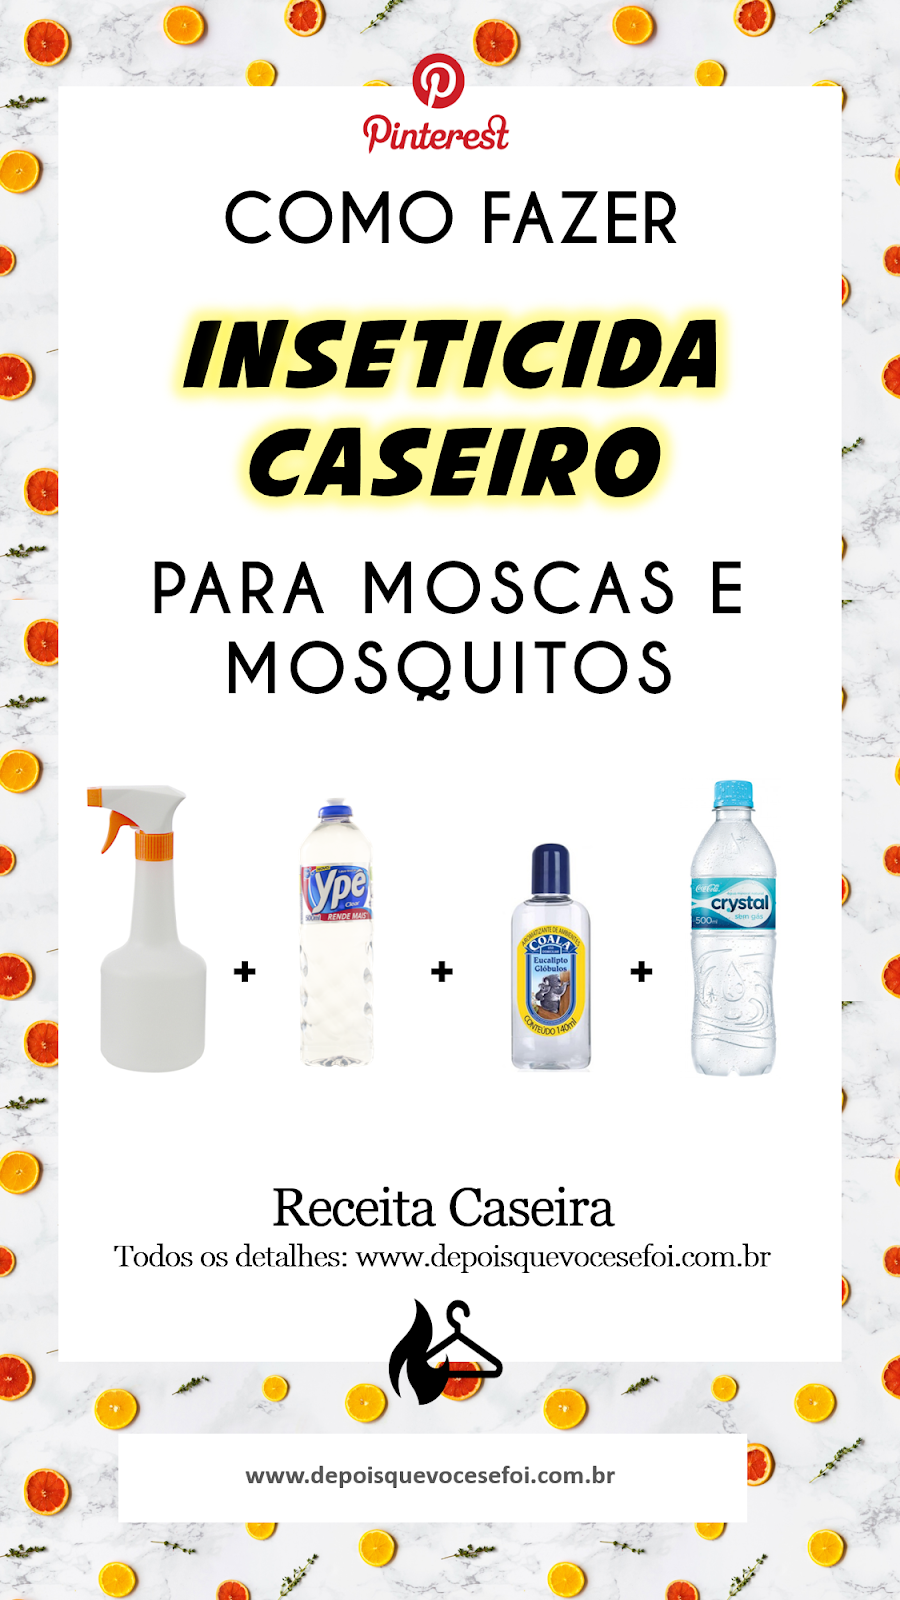 Inseticida Caseiro para moscas e mosquitos